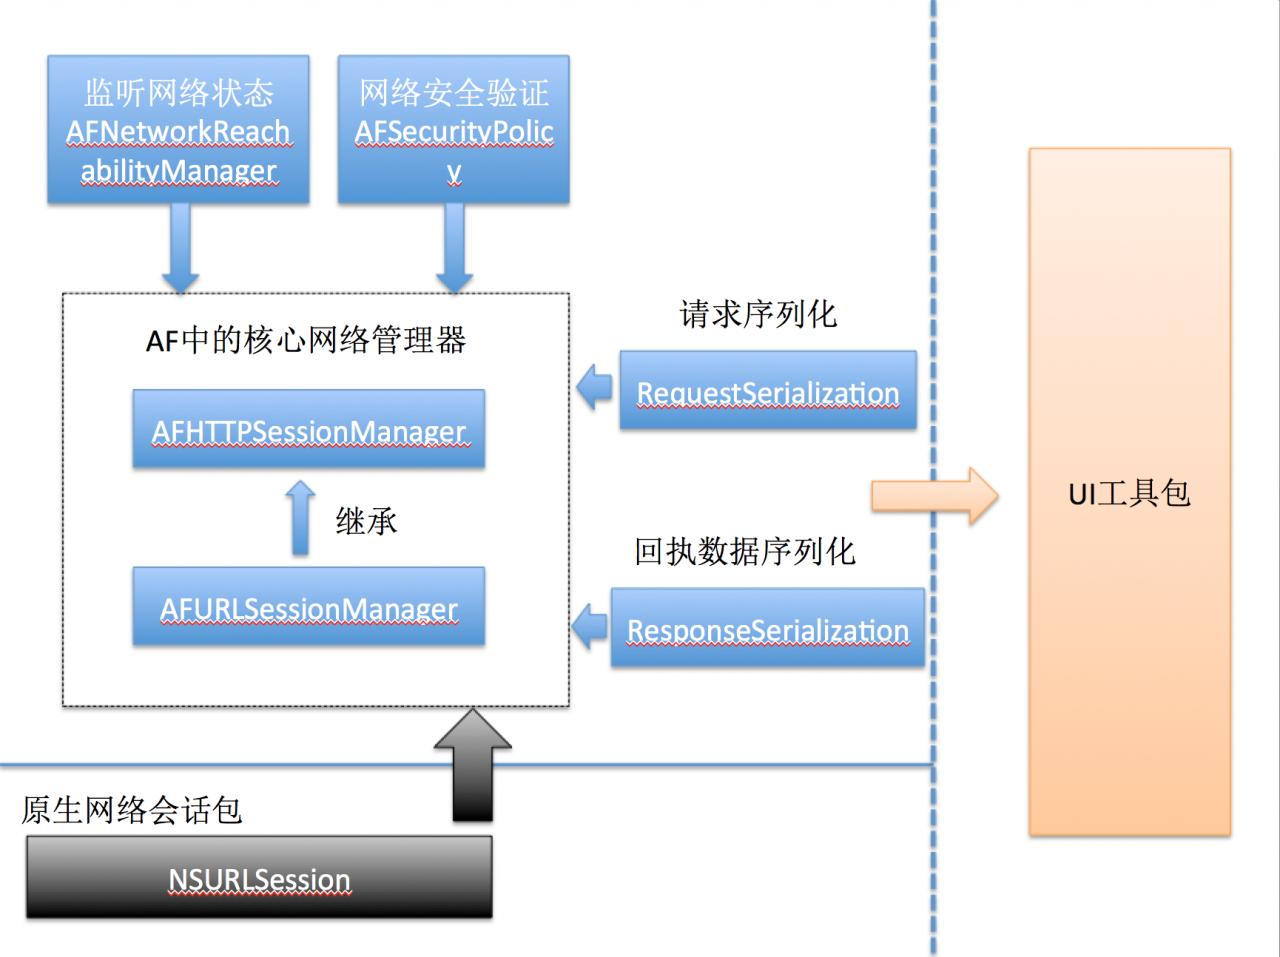 iOS开发-从AFNetworking源码分析到应用全解